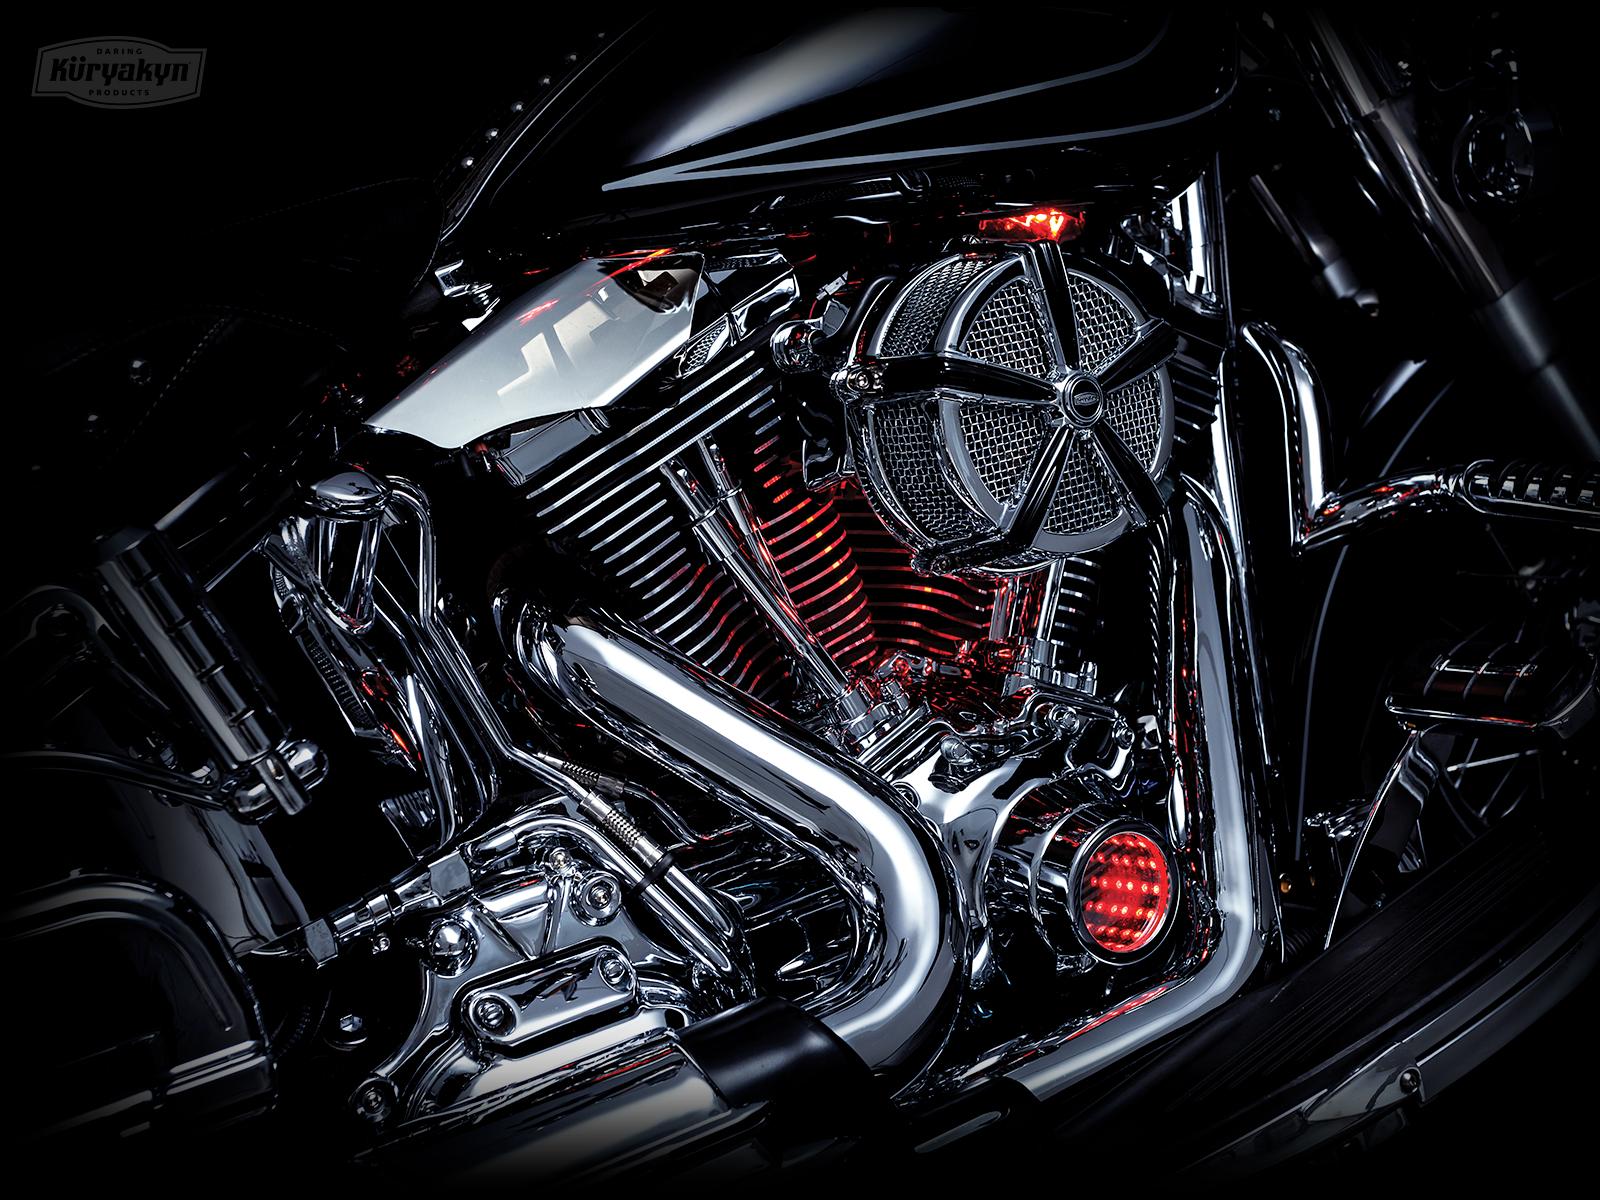 UKMOTO votre specialiste moto anglaise video 2 - UKMOTO votre specialiste moto anglaise video